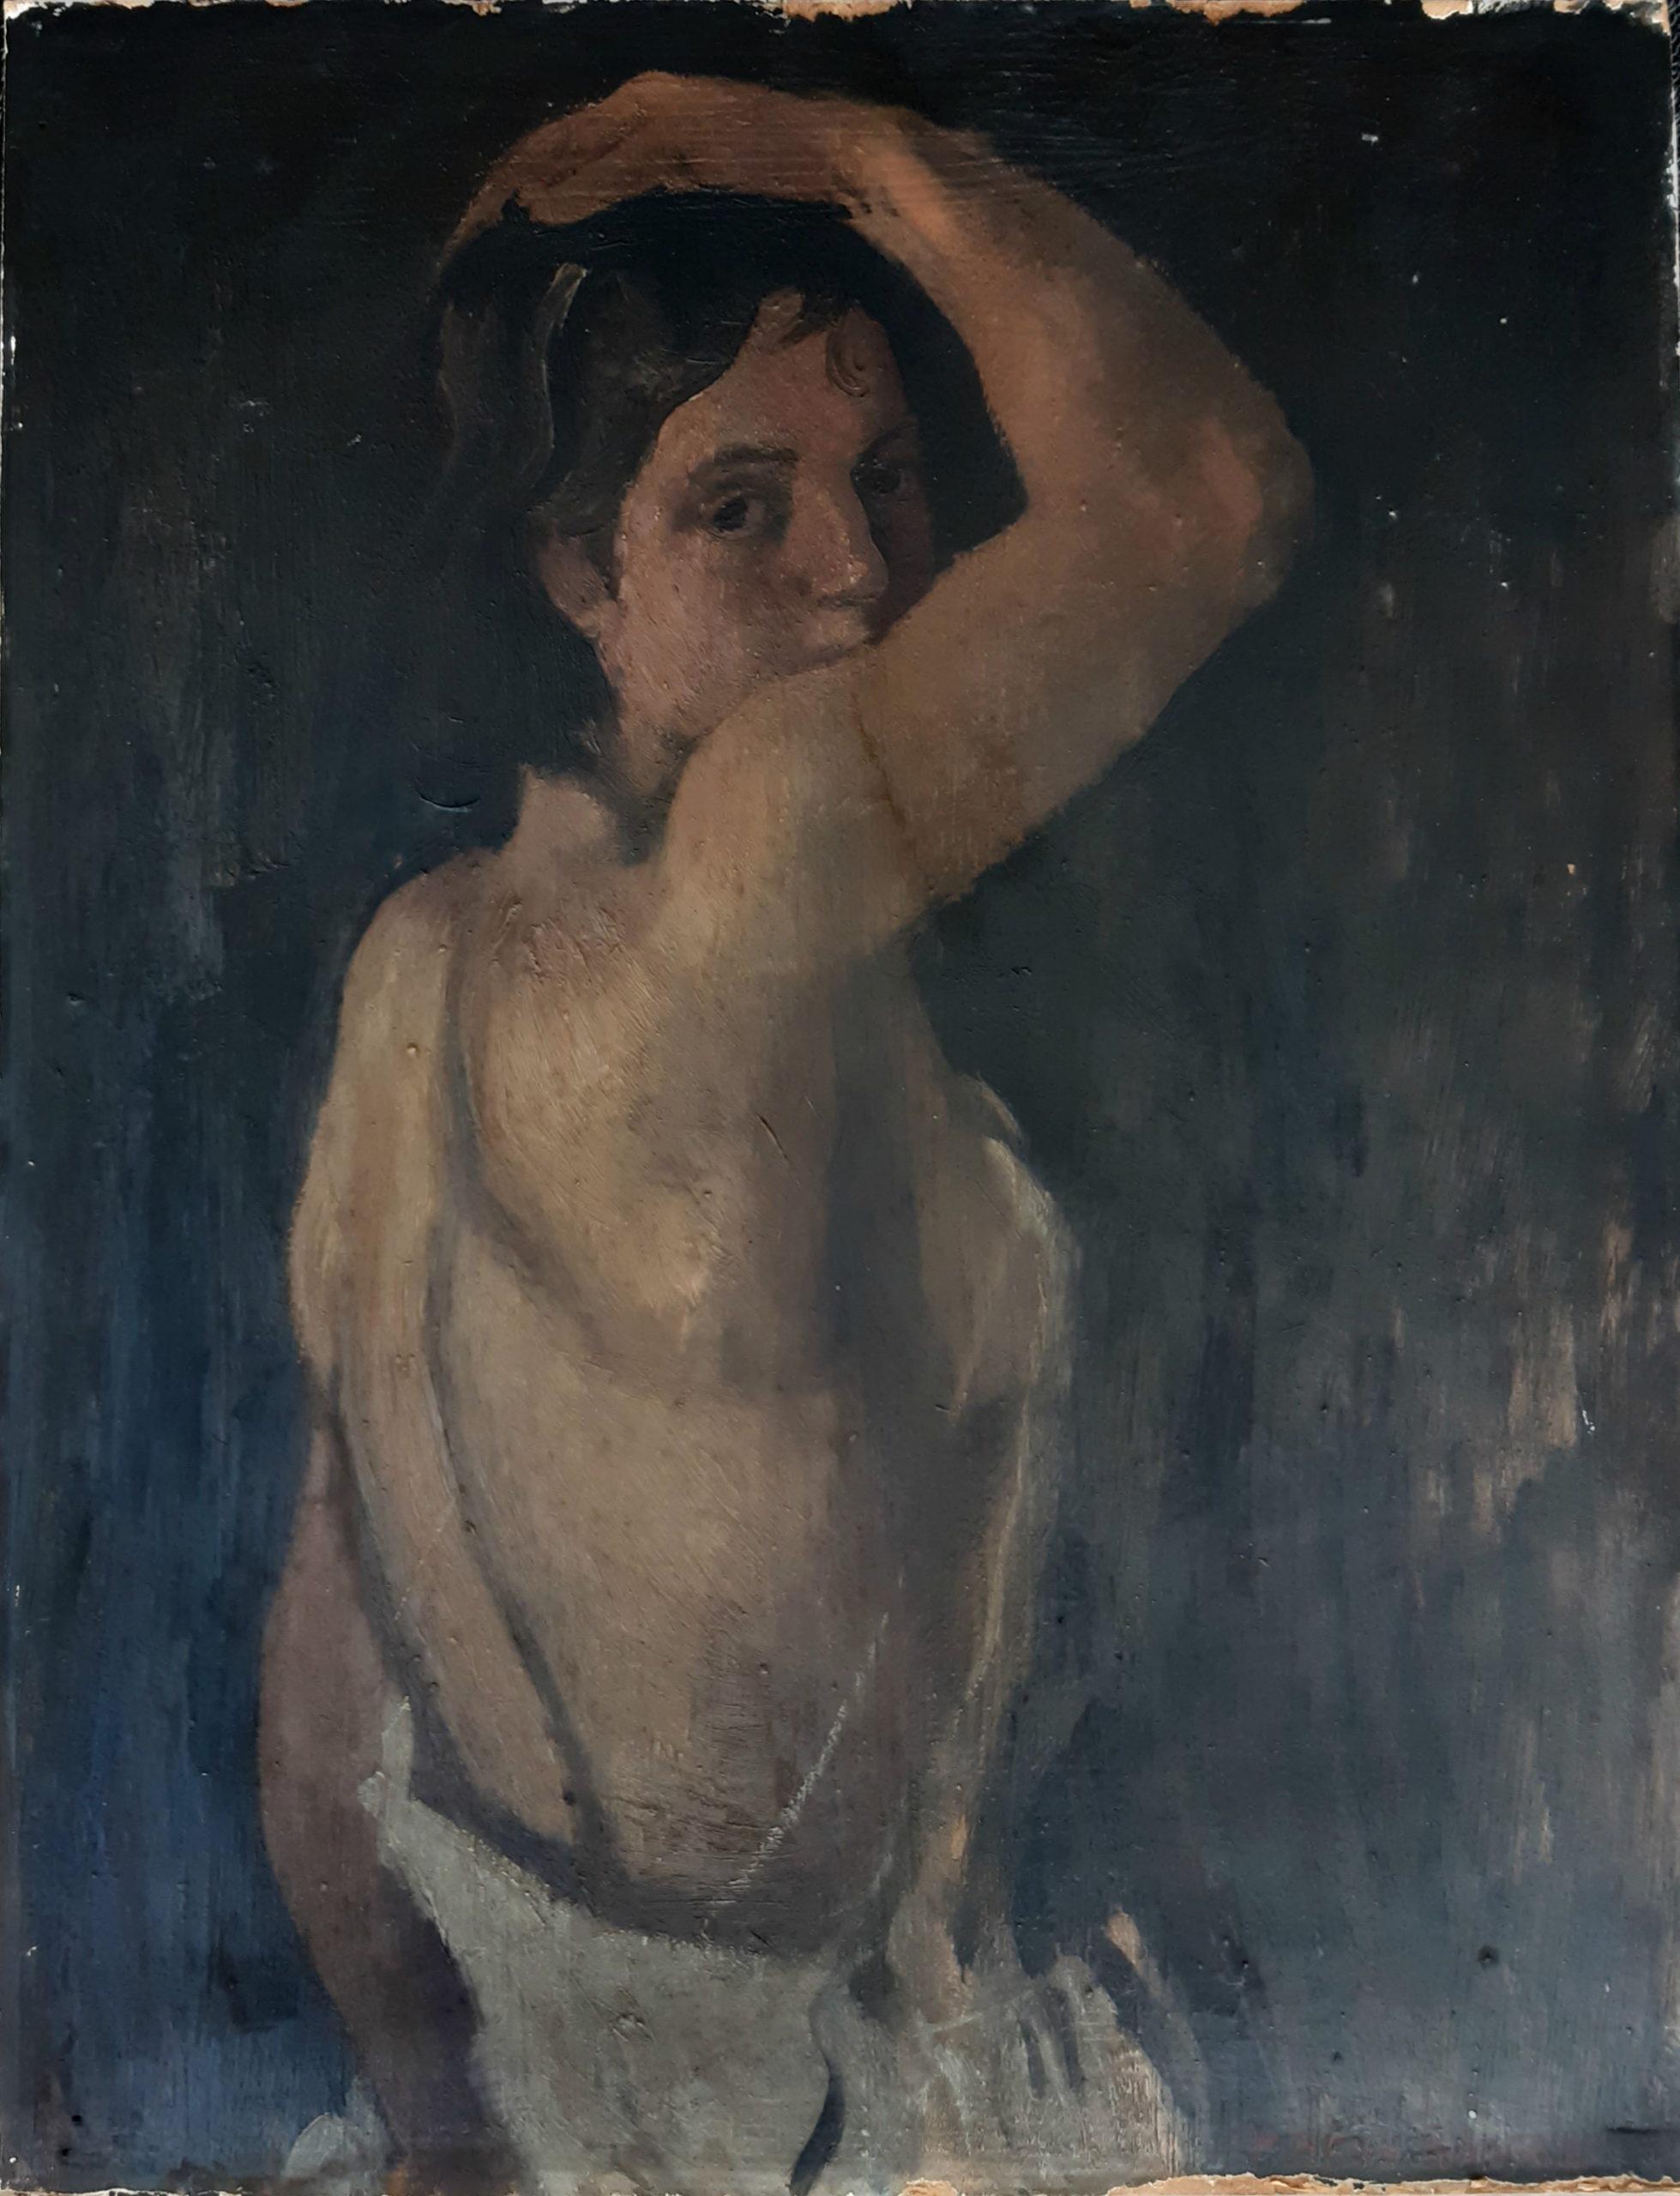 Torso, in the 30s